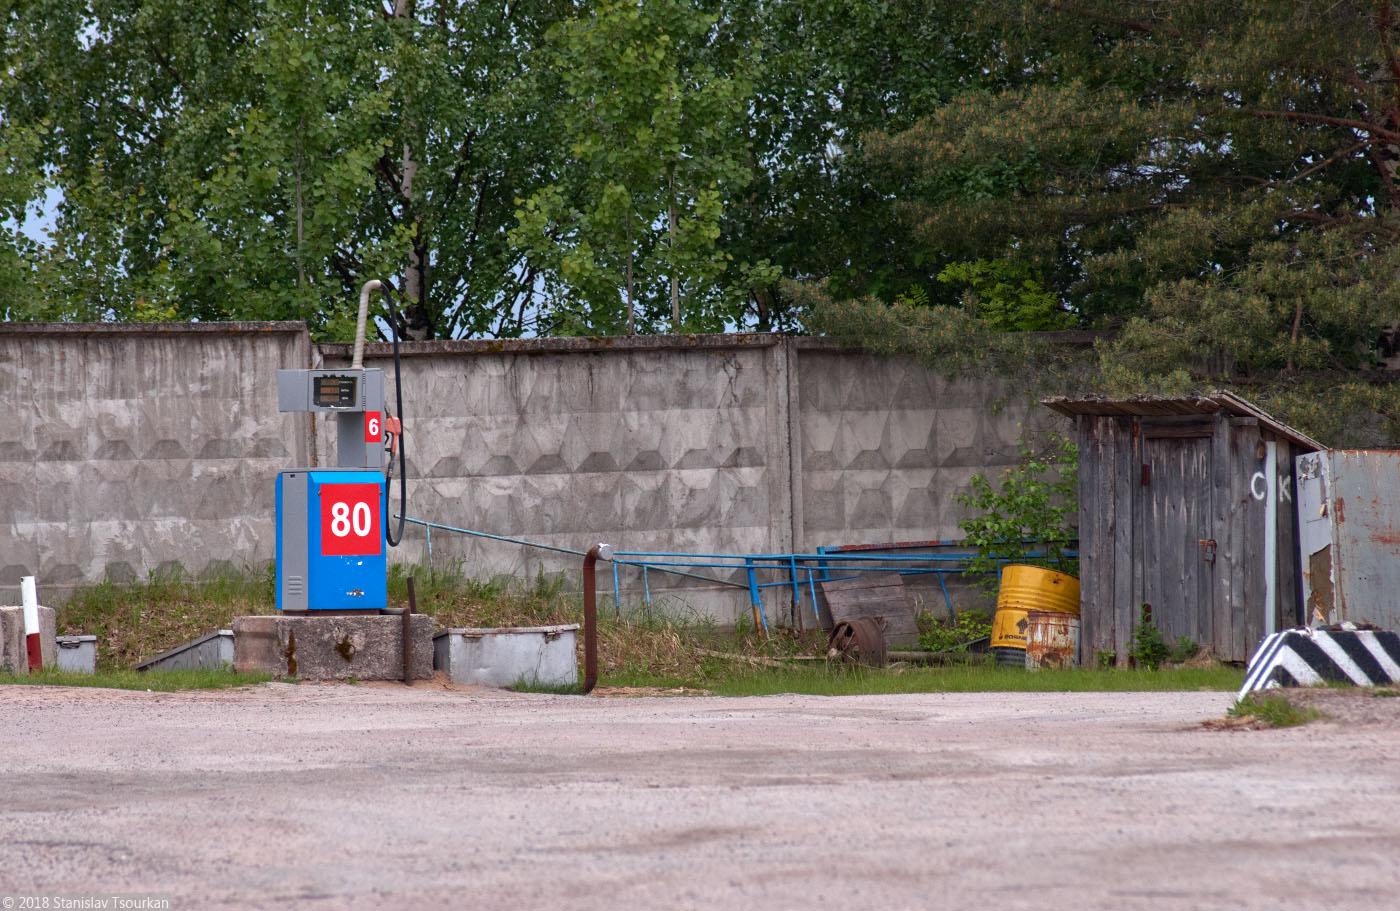 Пудож, Карелия, республика Карелия, заправка, АИ-80, 80-й бензин